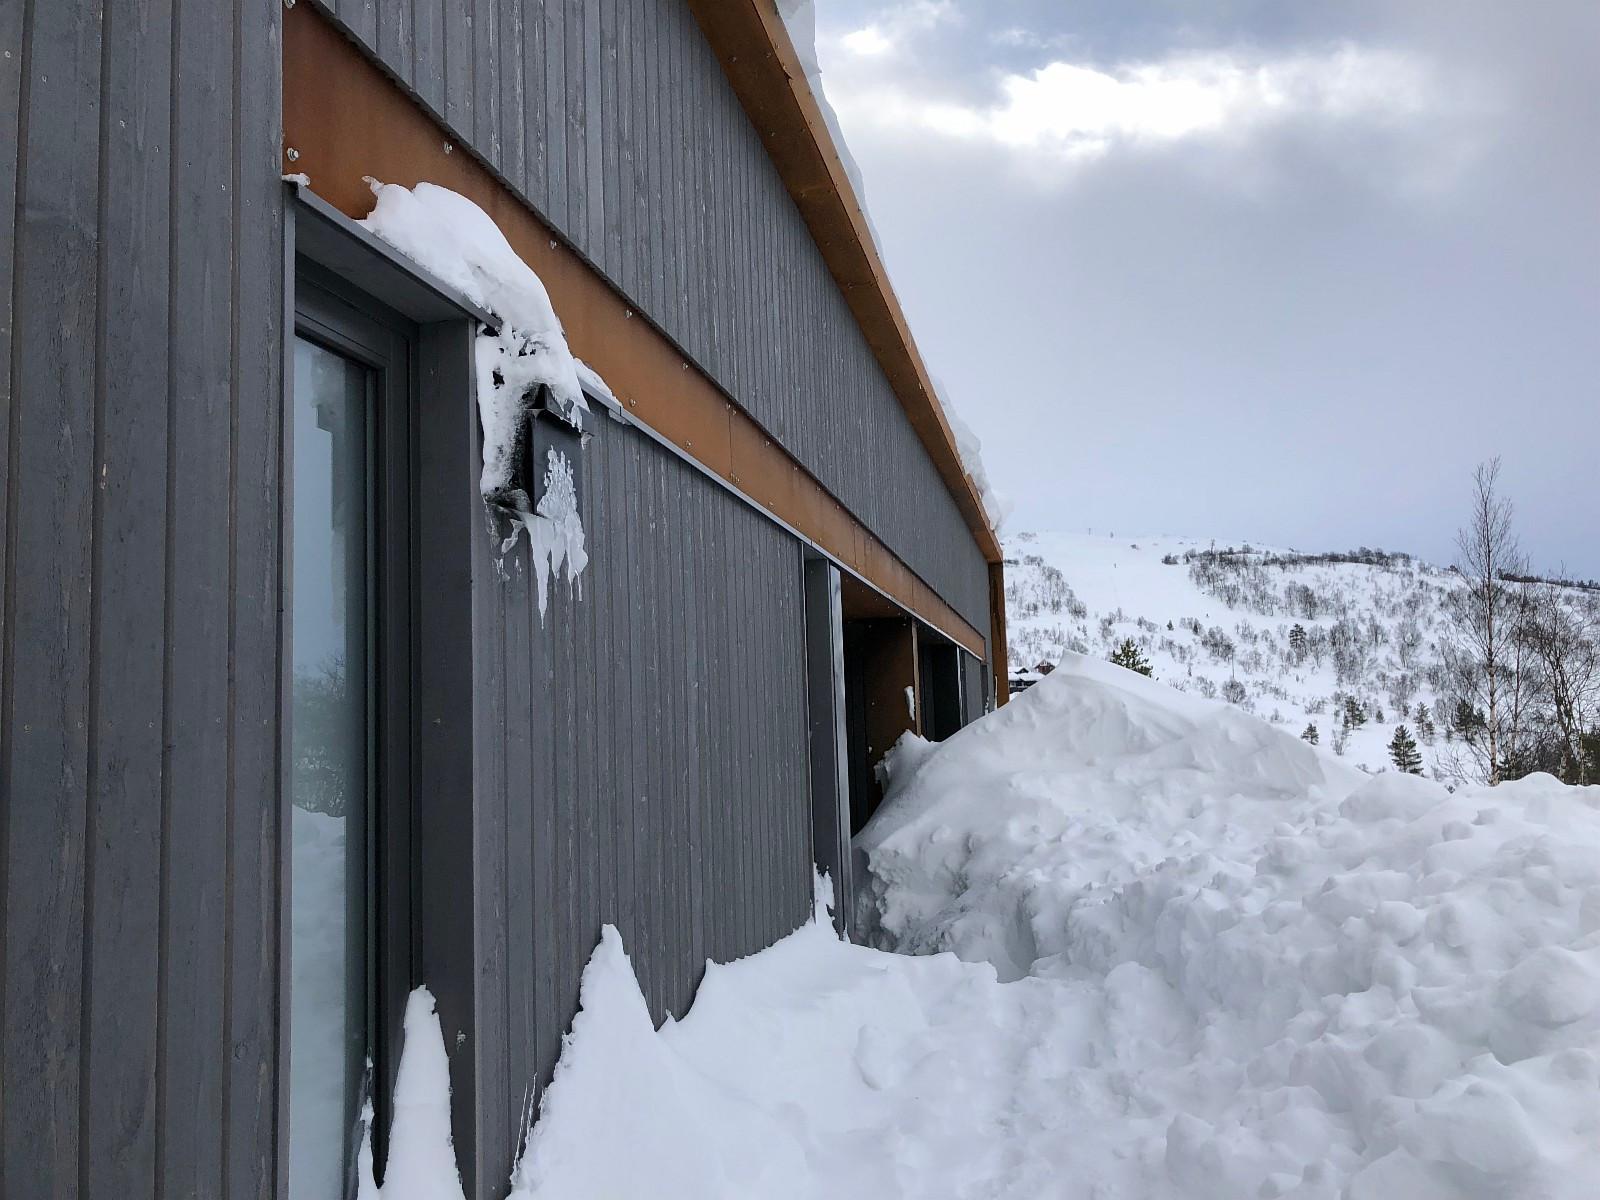 Det er meget snøsikkert på Hattevarden - beliggende på nesten 600 m.o.h.